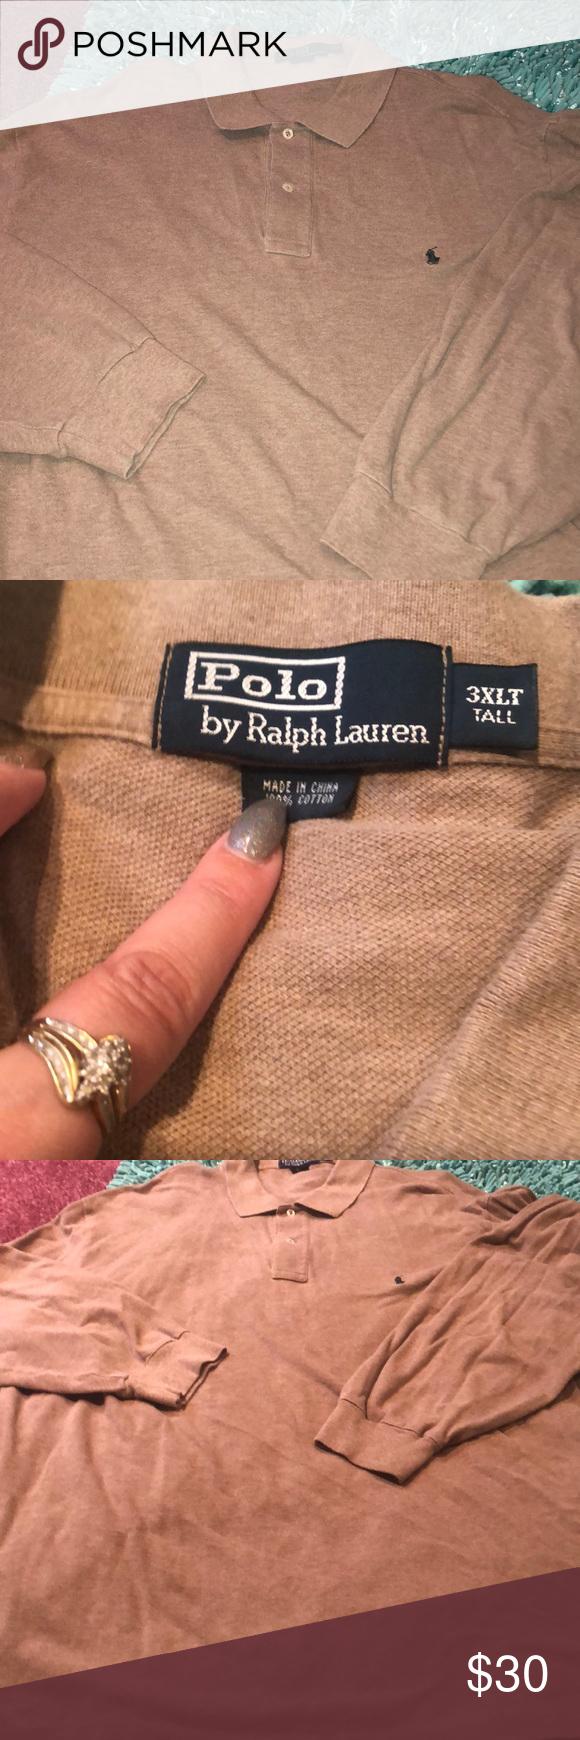 Polo Shirt Long sleeve polo shirt, Polo shirt, Long